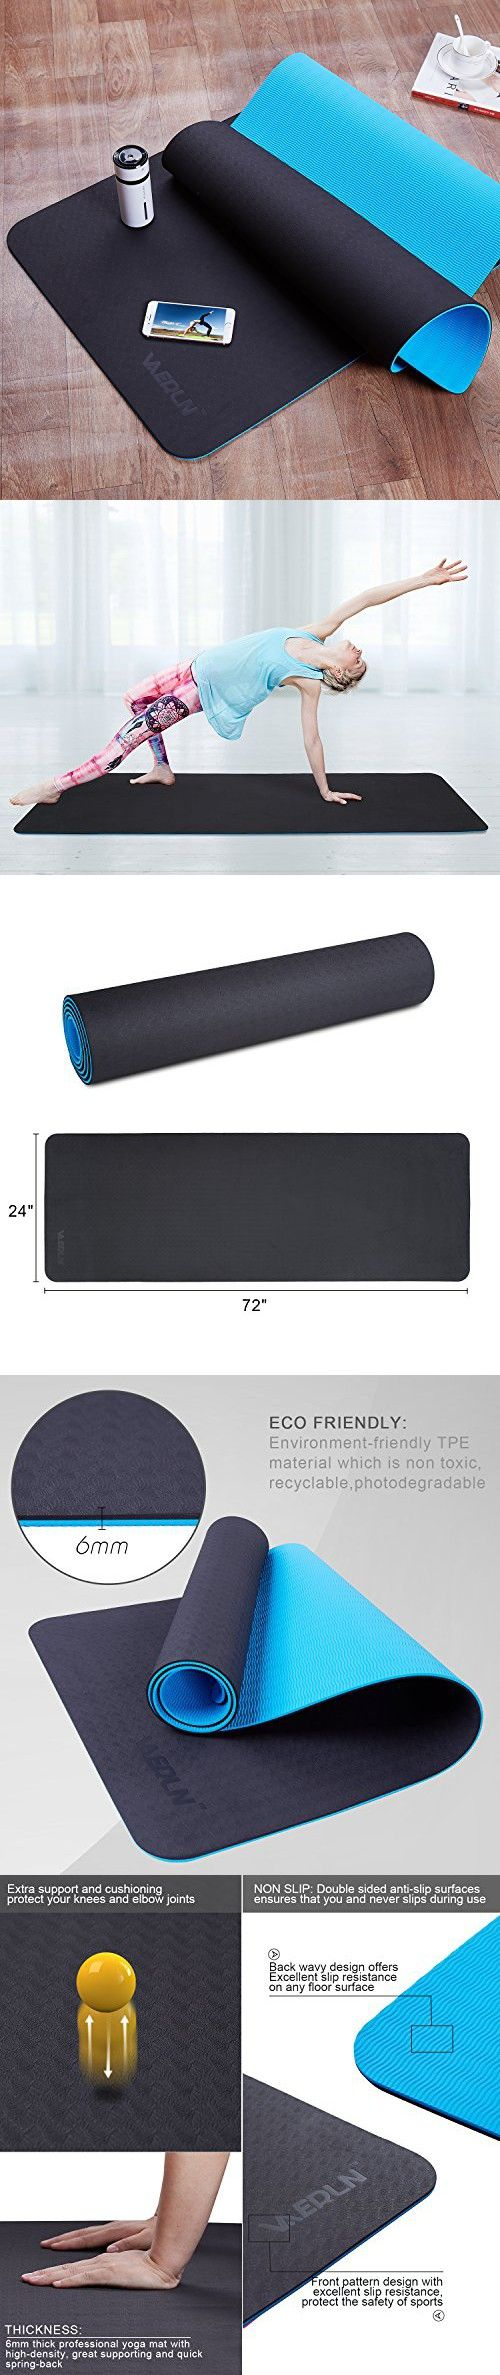 Vanerdun Non Slip Tpe Yoga Mat Eco Friendly Anti Tear Pilates Mat Extra Large 72 X 24 Thick 1 4 Inch 6mm Fit Yoga Pilates Fitness Exercise Pilates Workout Mat Pilates Yoga Pilates